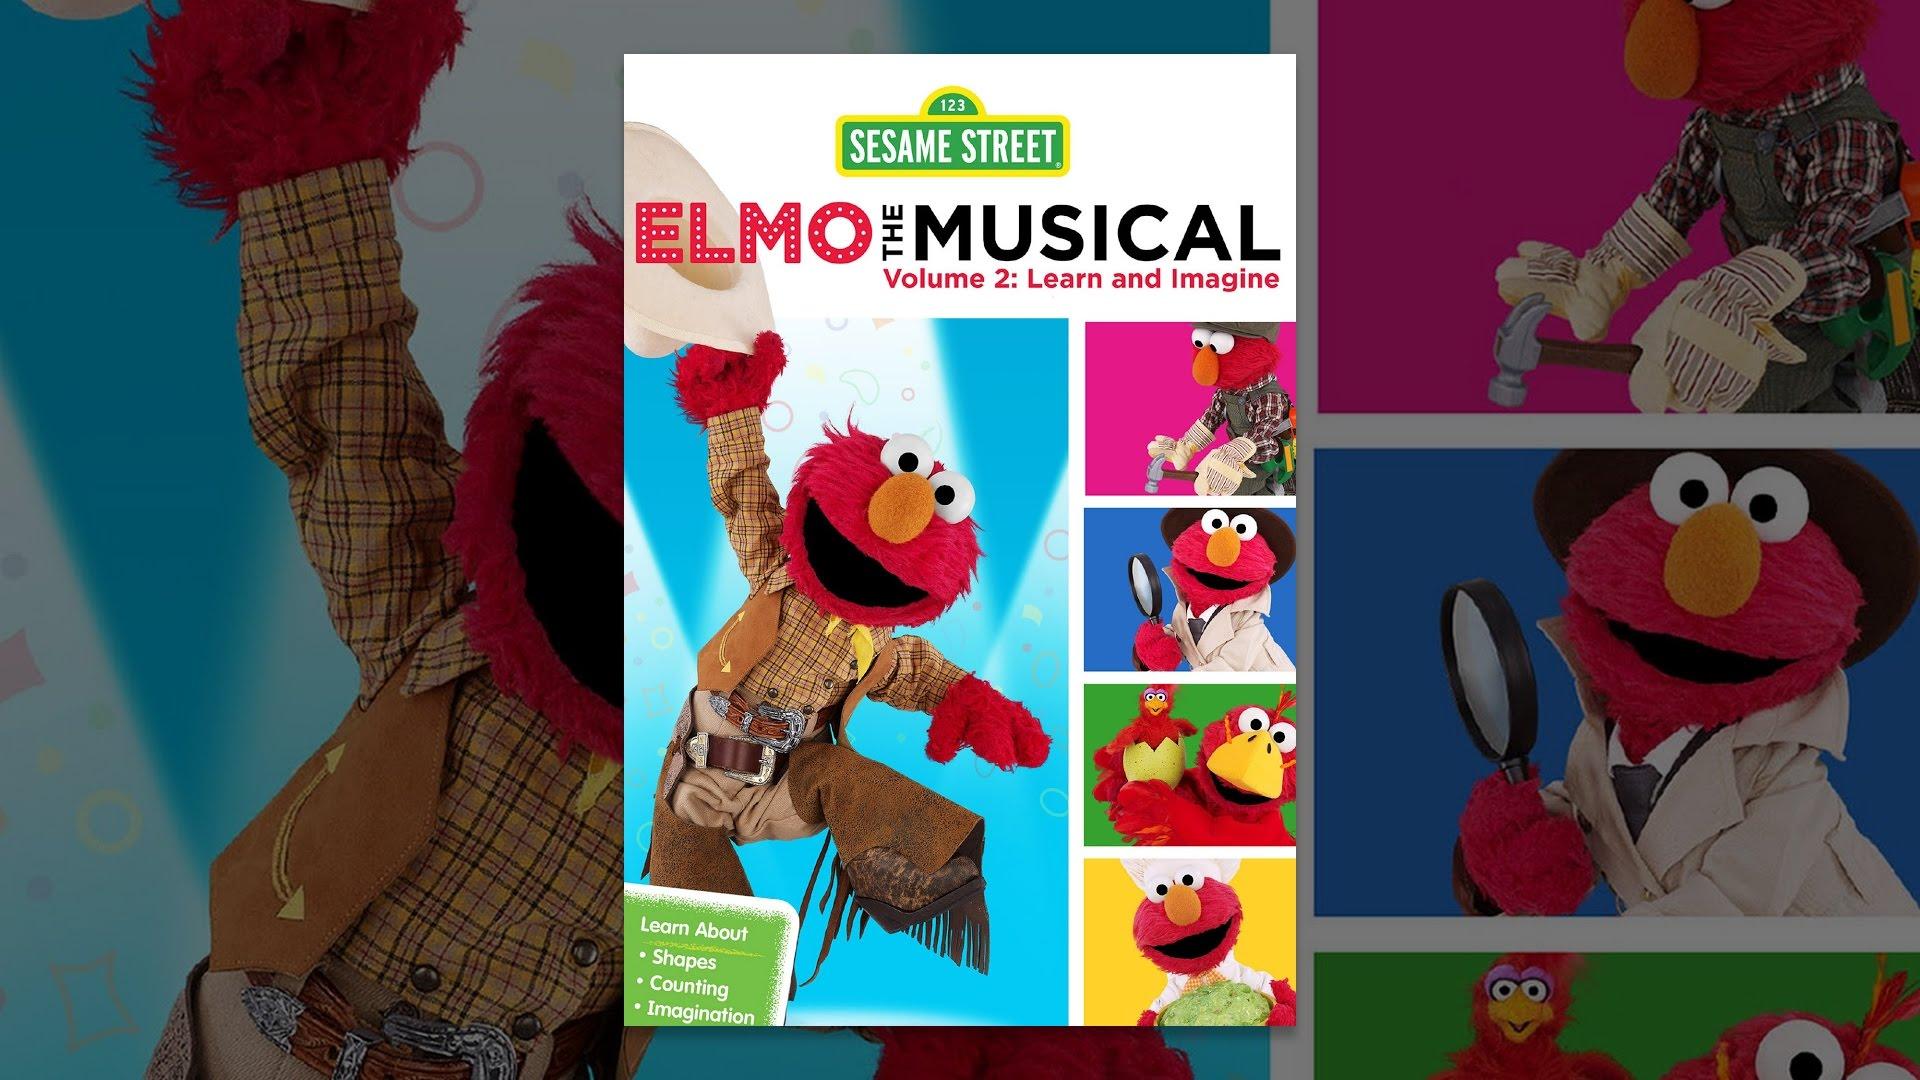 Sesame Street: Elmo: The Musical 2